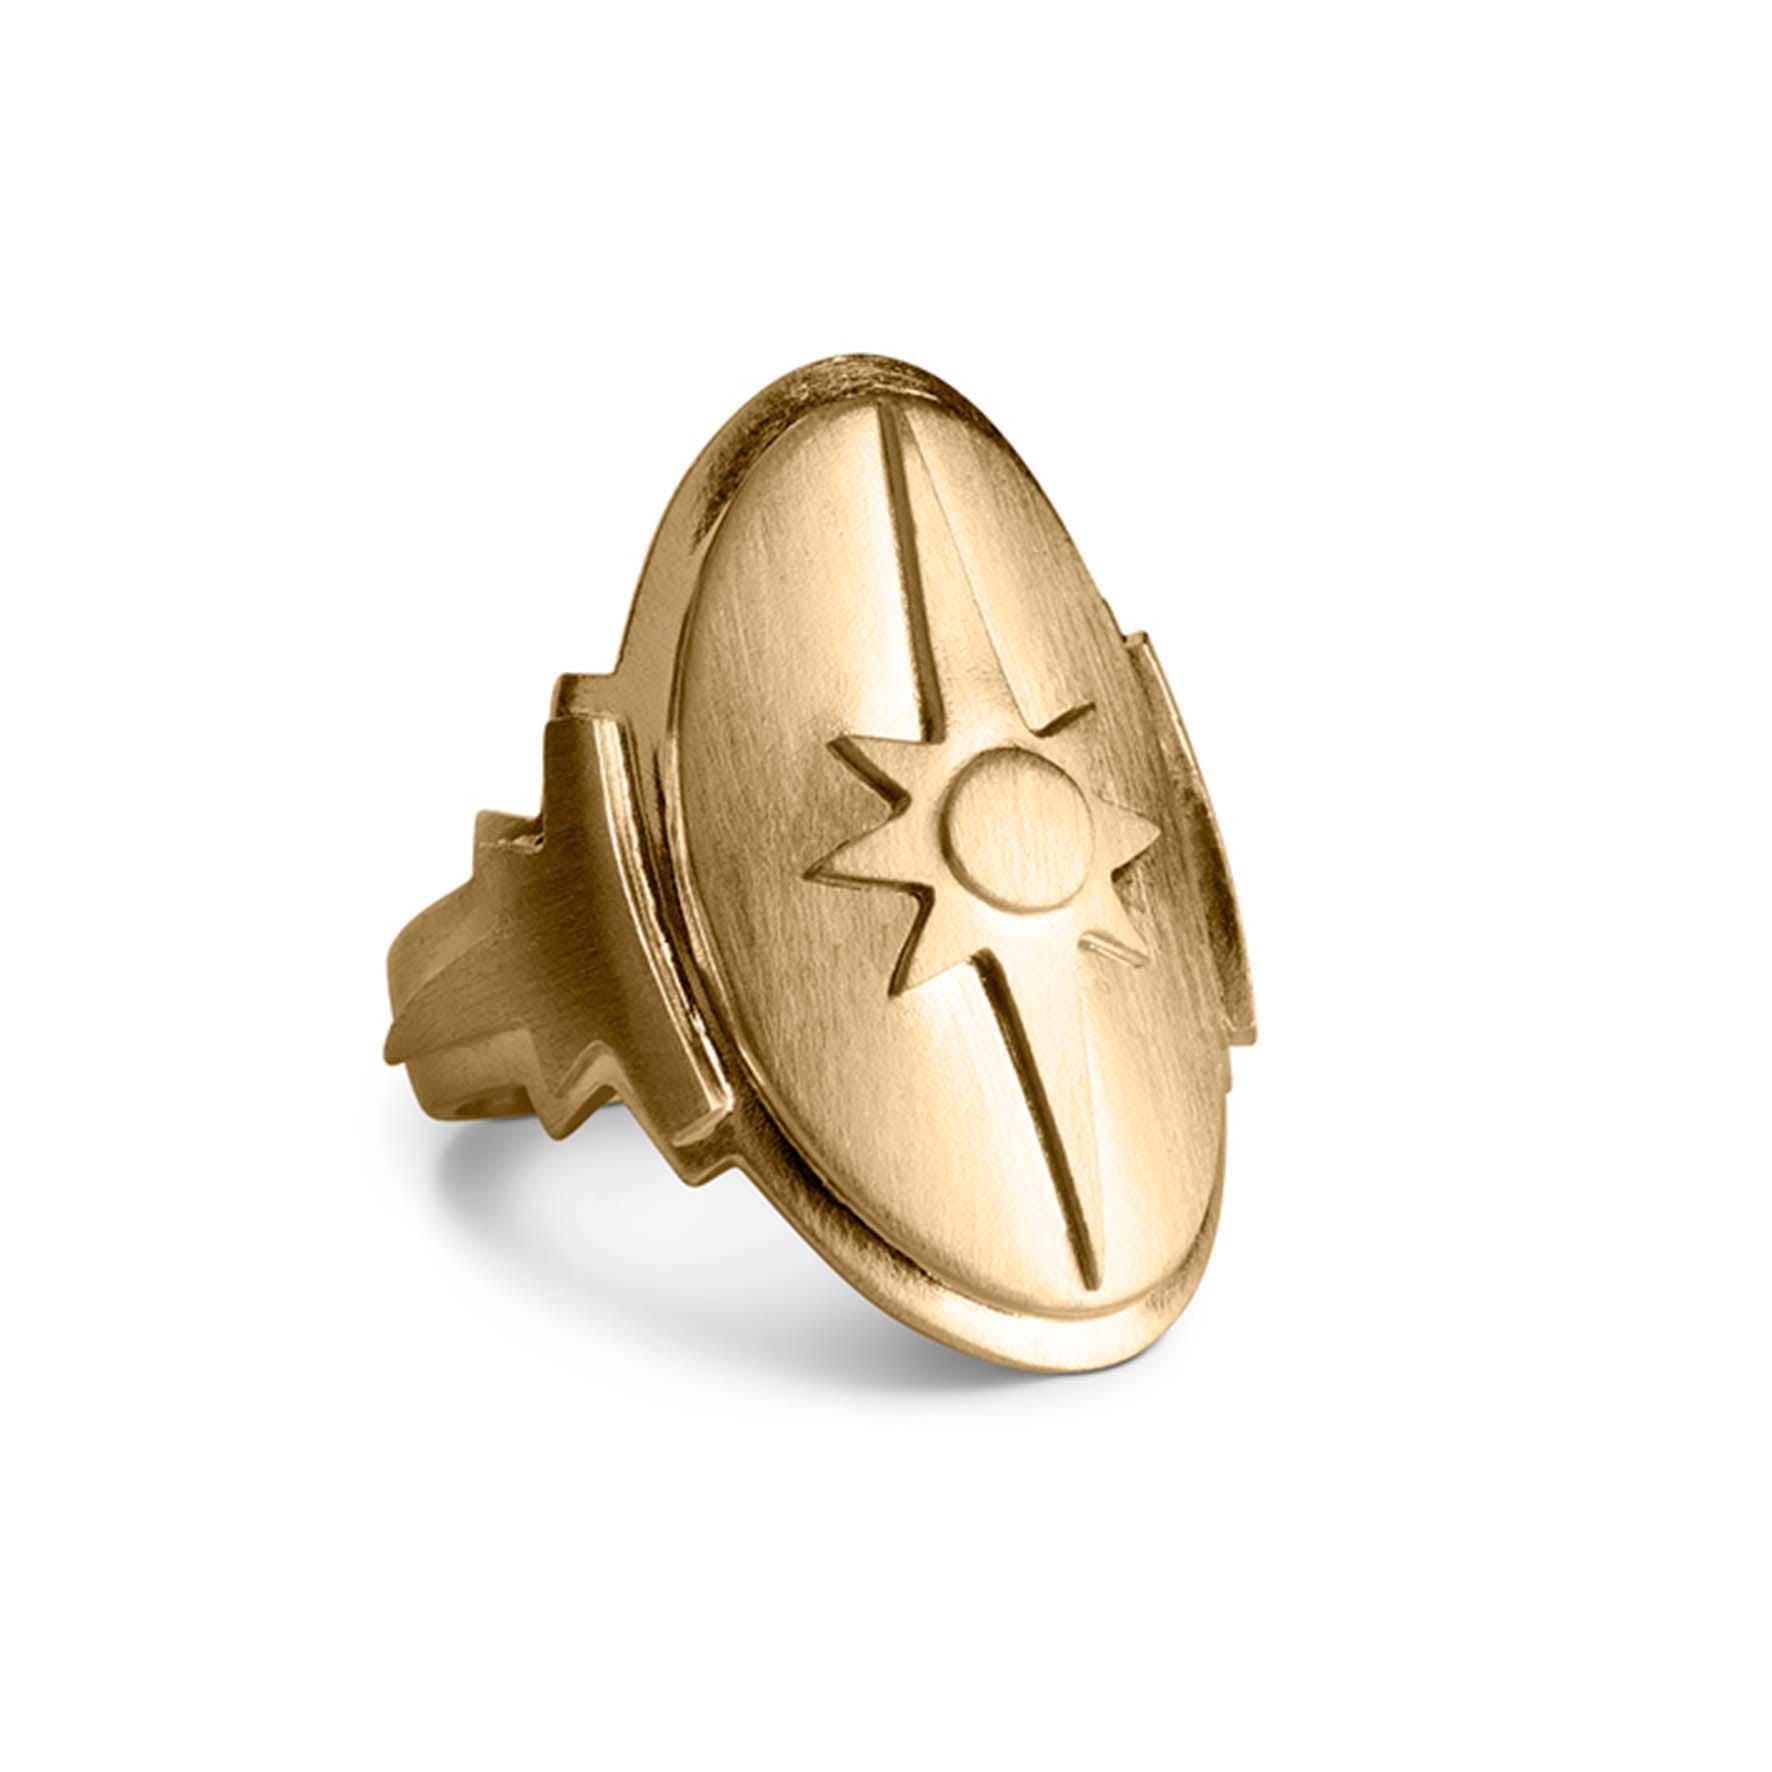 Shield Ring von Jane Kønig in Vergoldet-Silber Sterling 925